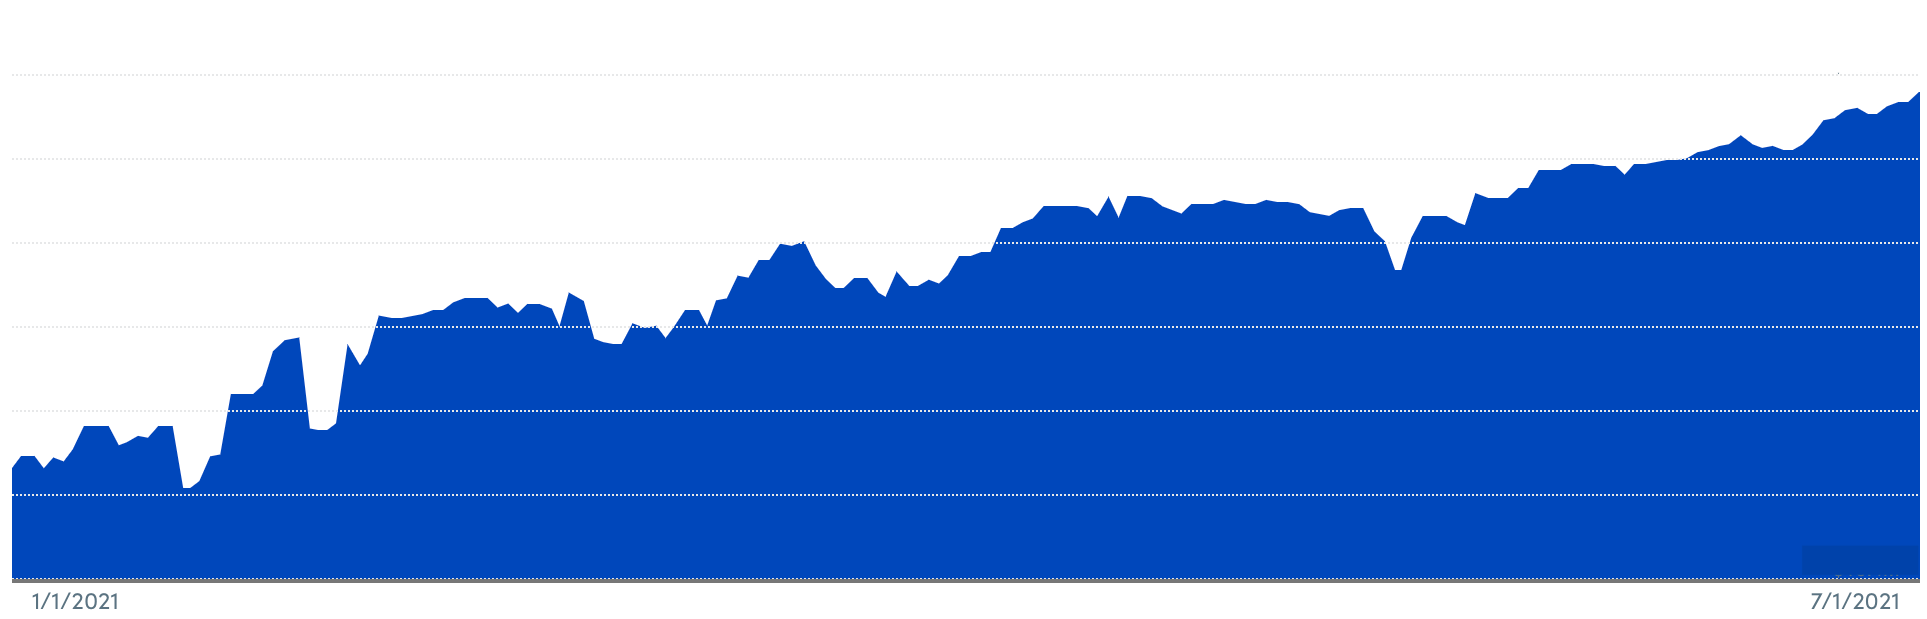 1H 2021 Financial Samurai Net Worth Chart